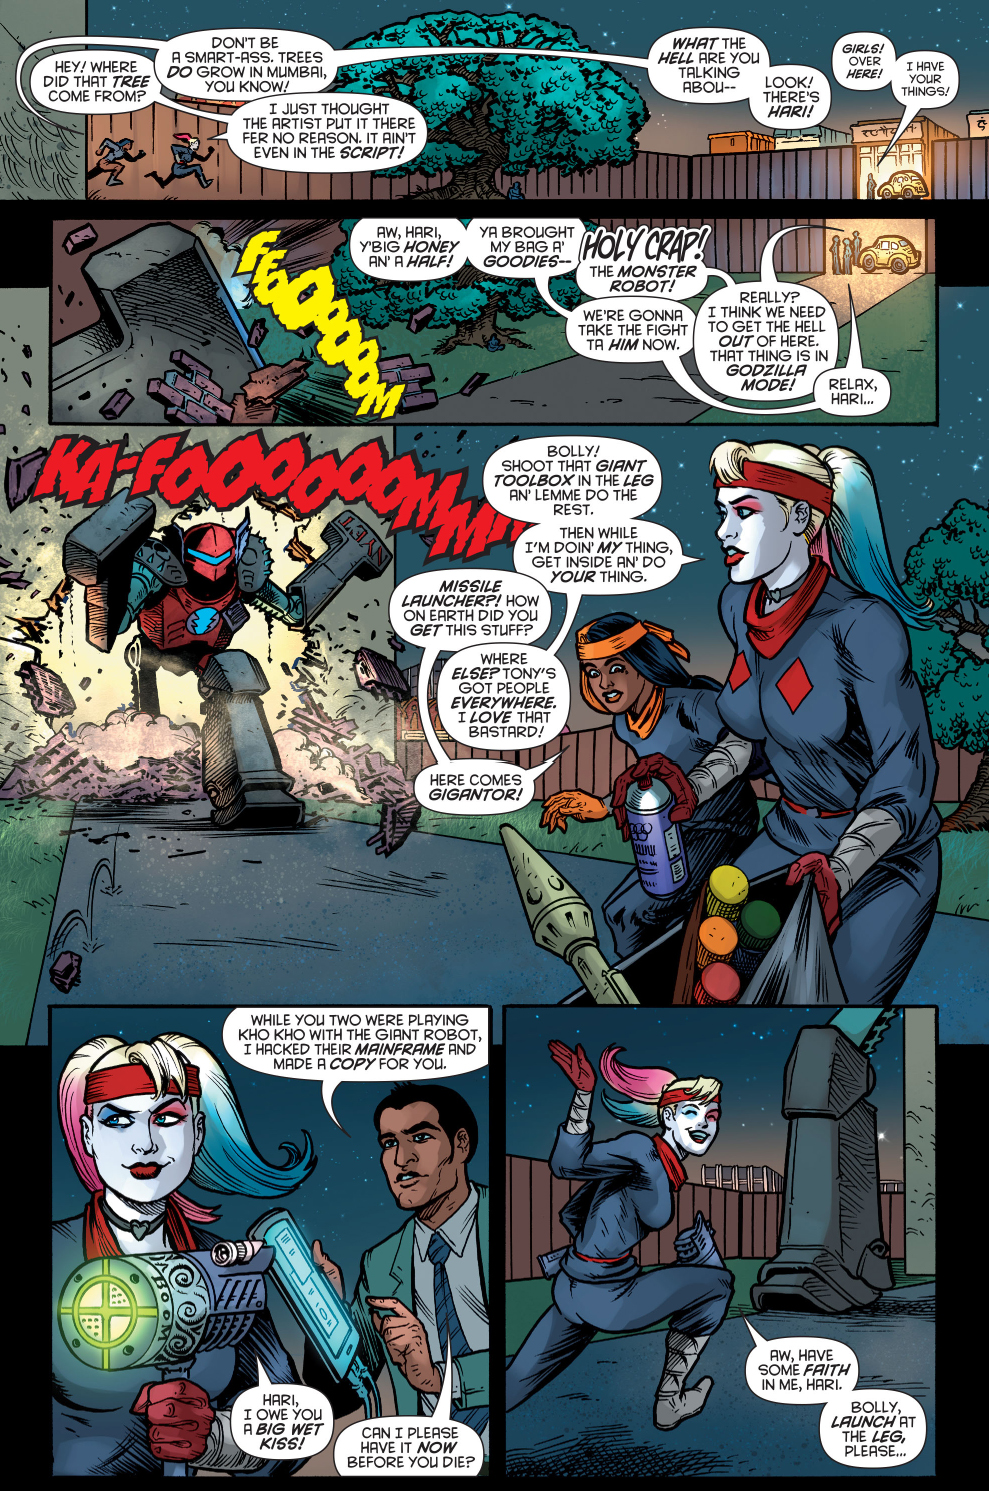 Harley Quinn Takes Down An Indian Call Center Scam